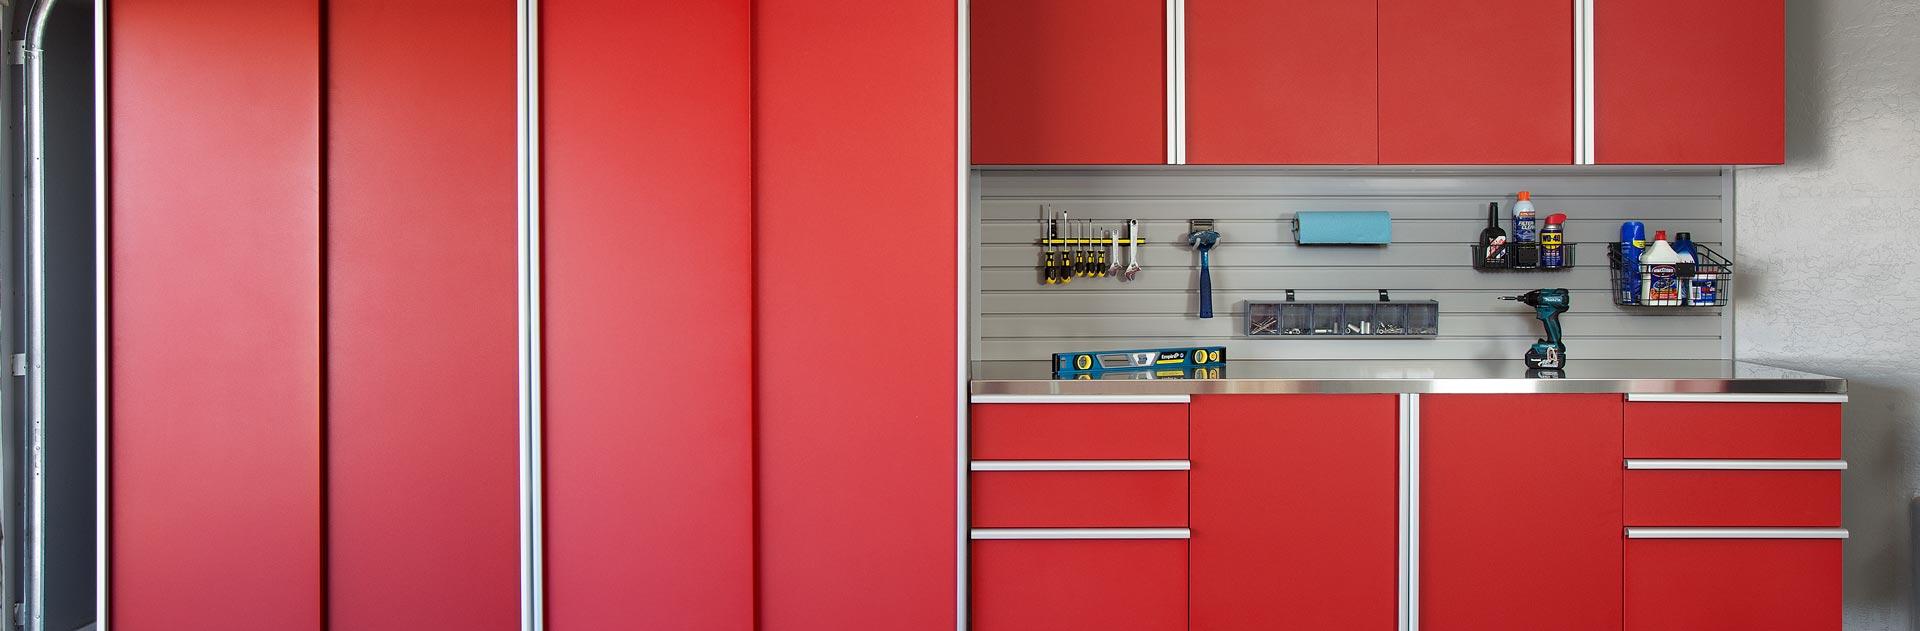 Custom Garage Cabinets and Workbench